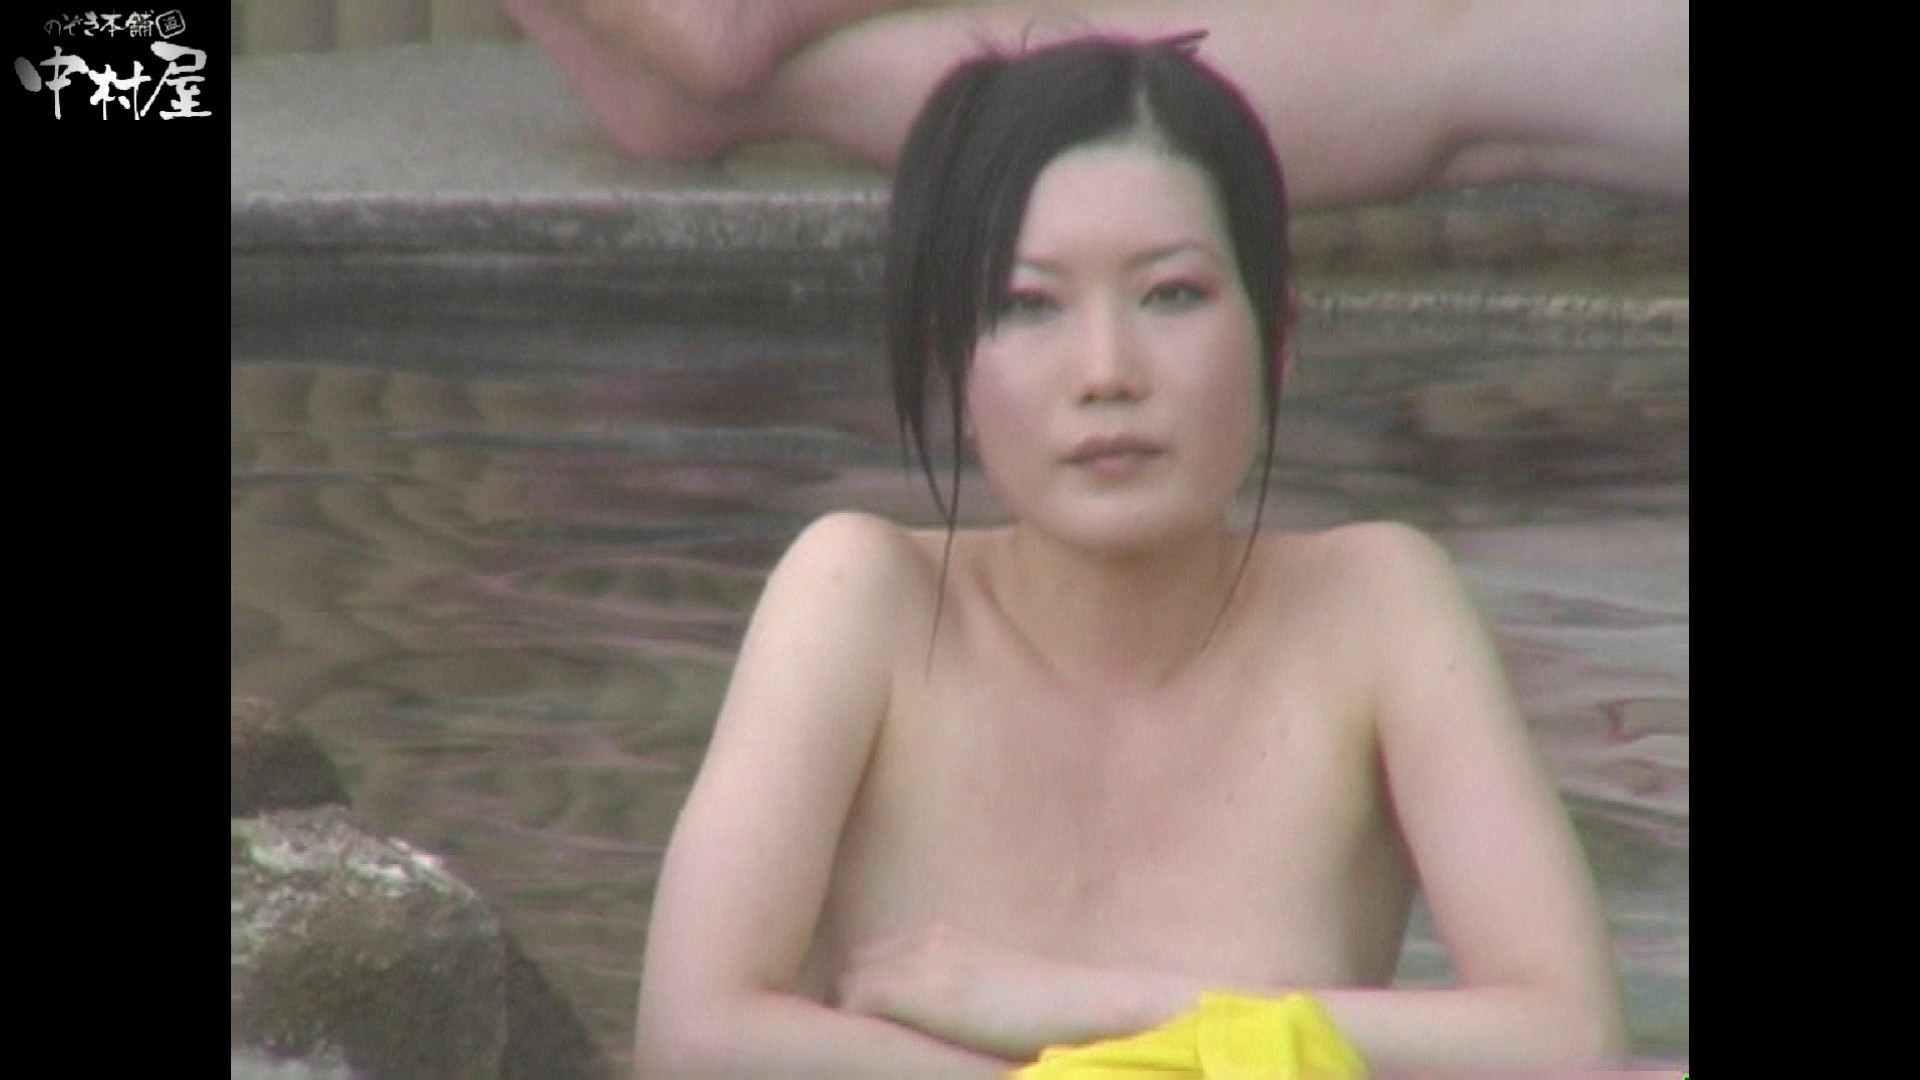 Aquaな露天風呂Vol.940 OLセックス  98画像 42